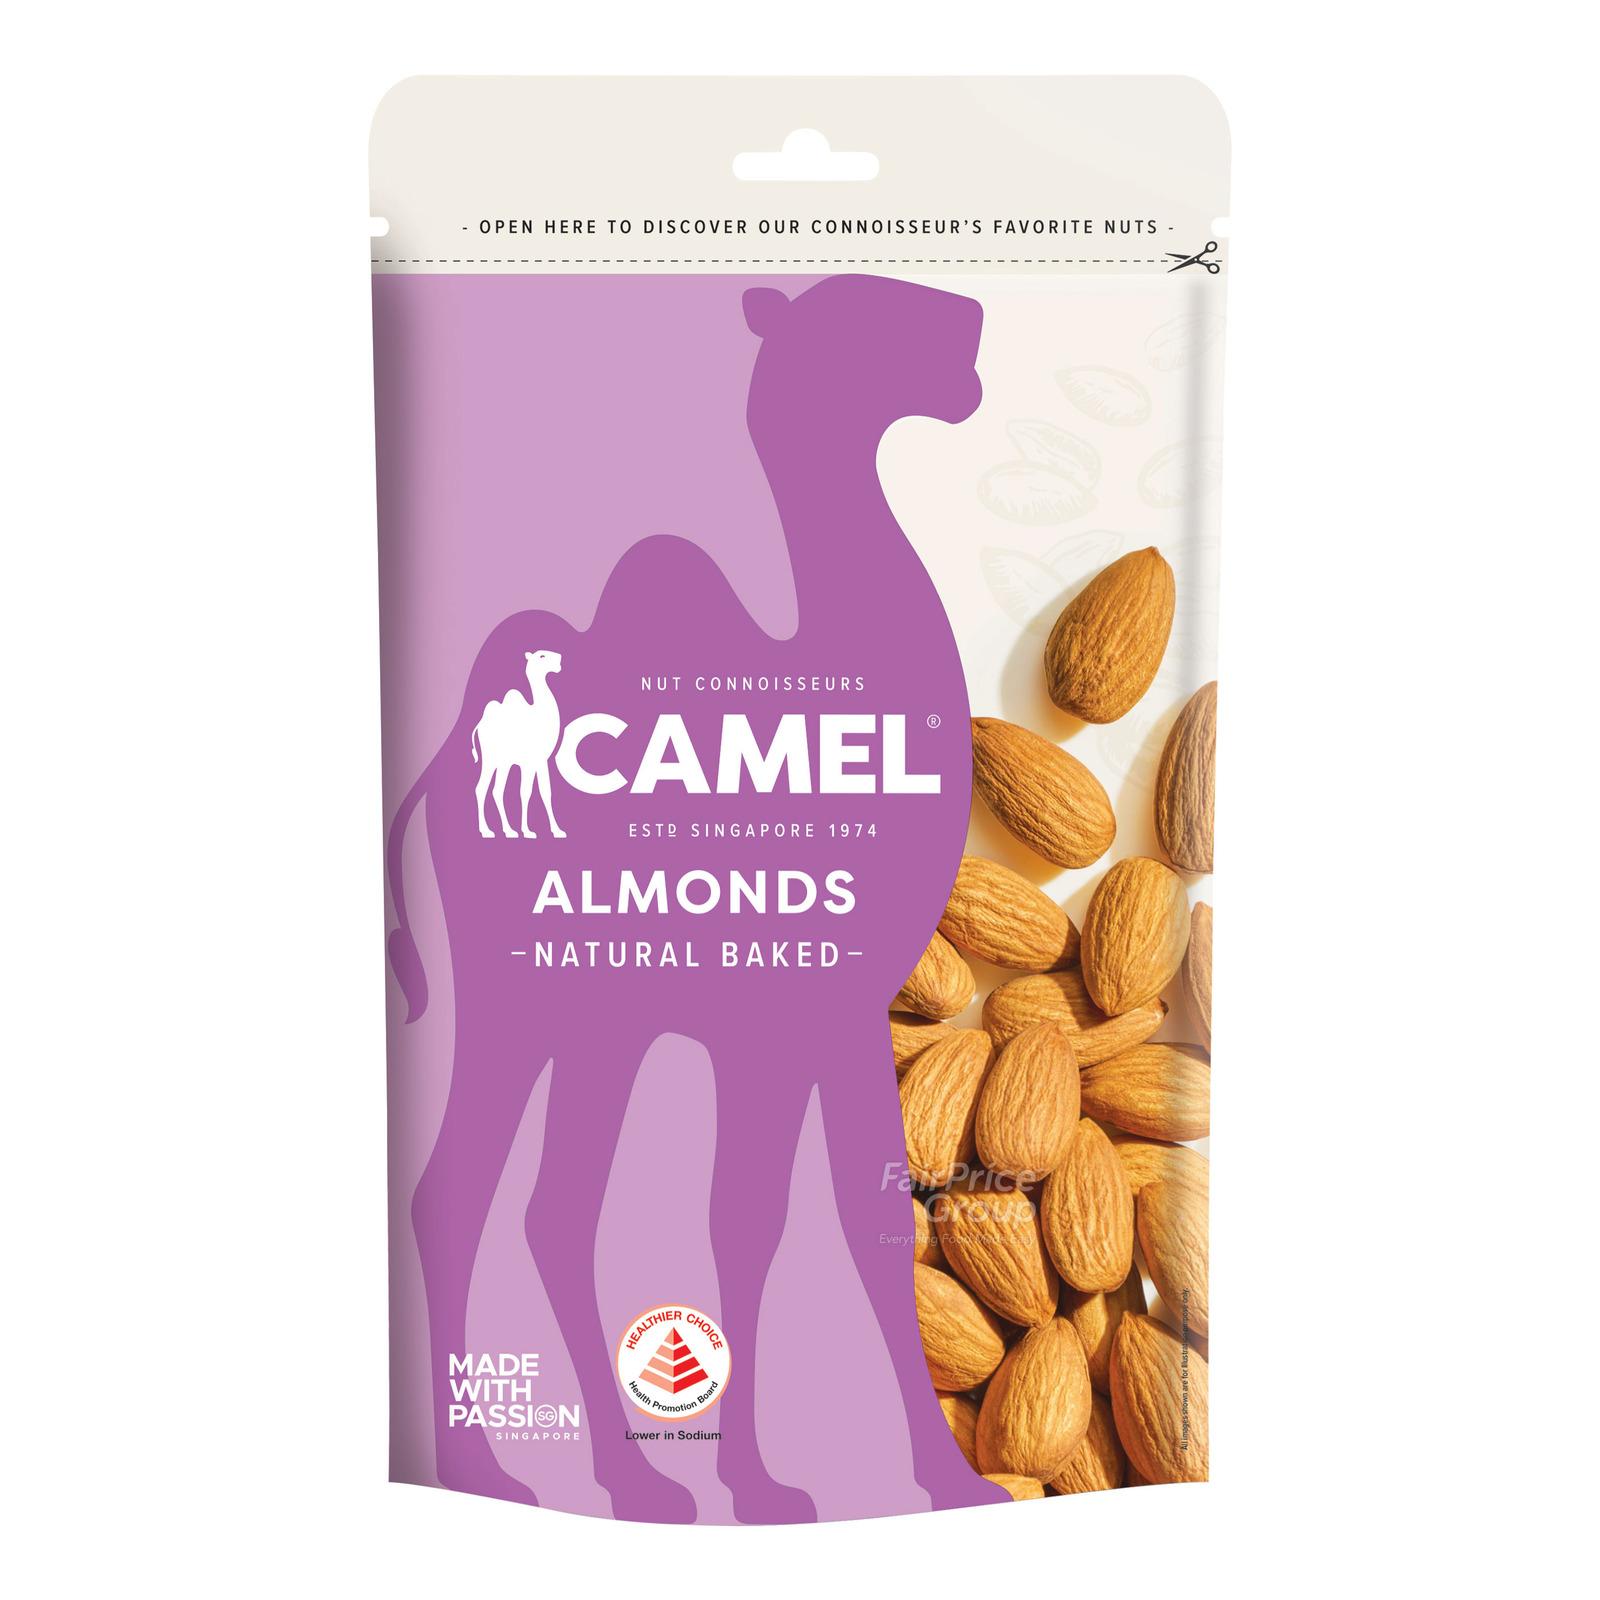 Camel Roasted Almonds